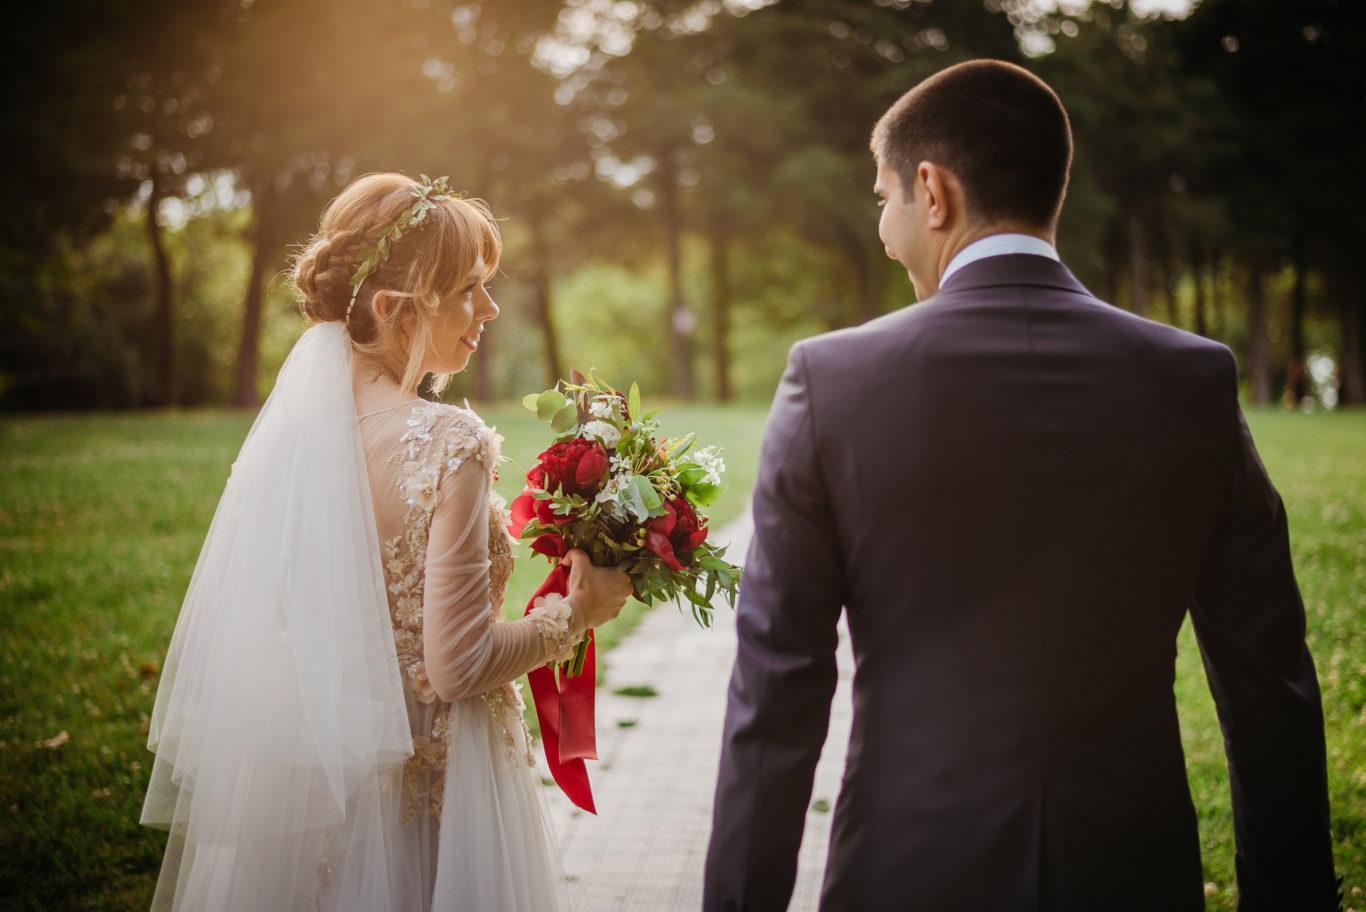 0242-Fotografie-nunta-Stirbey-Laura-Rares-fotograf-Ciprian-Dumitrescu-DSC_6630